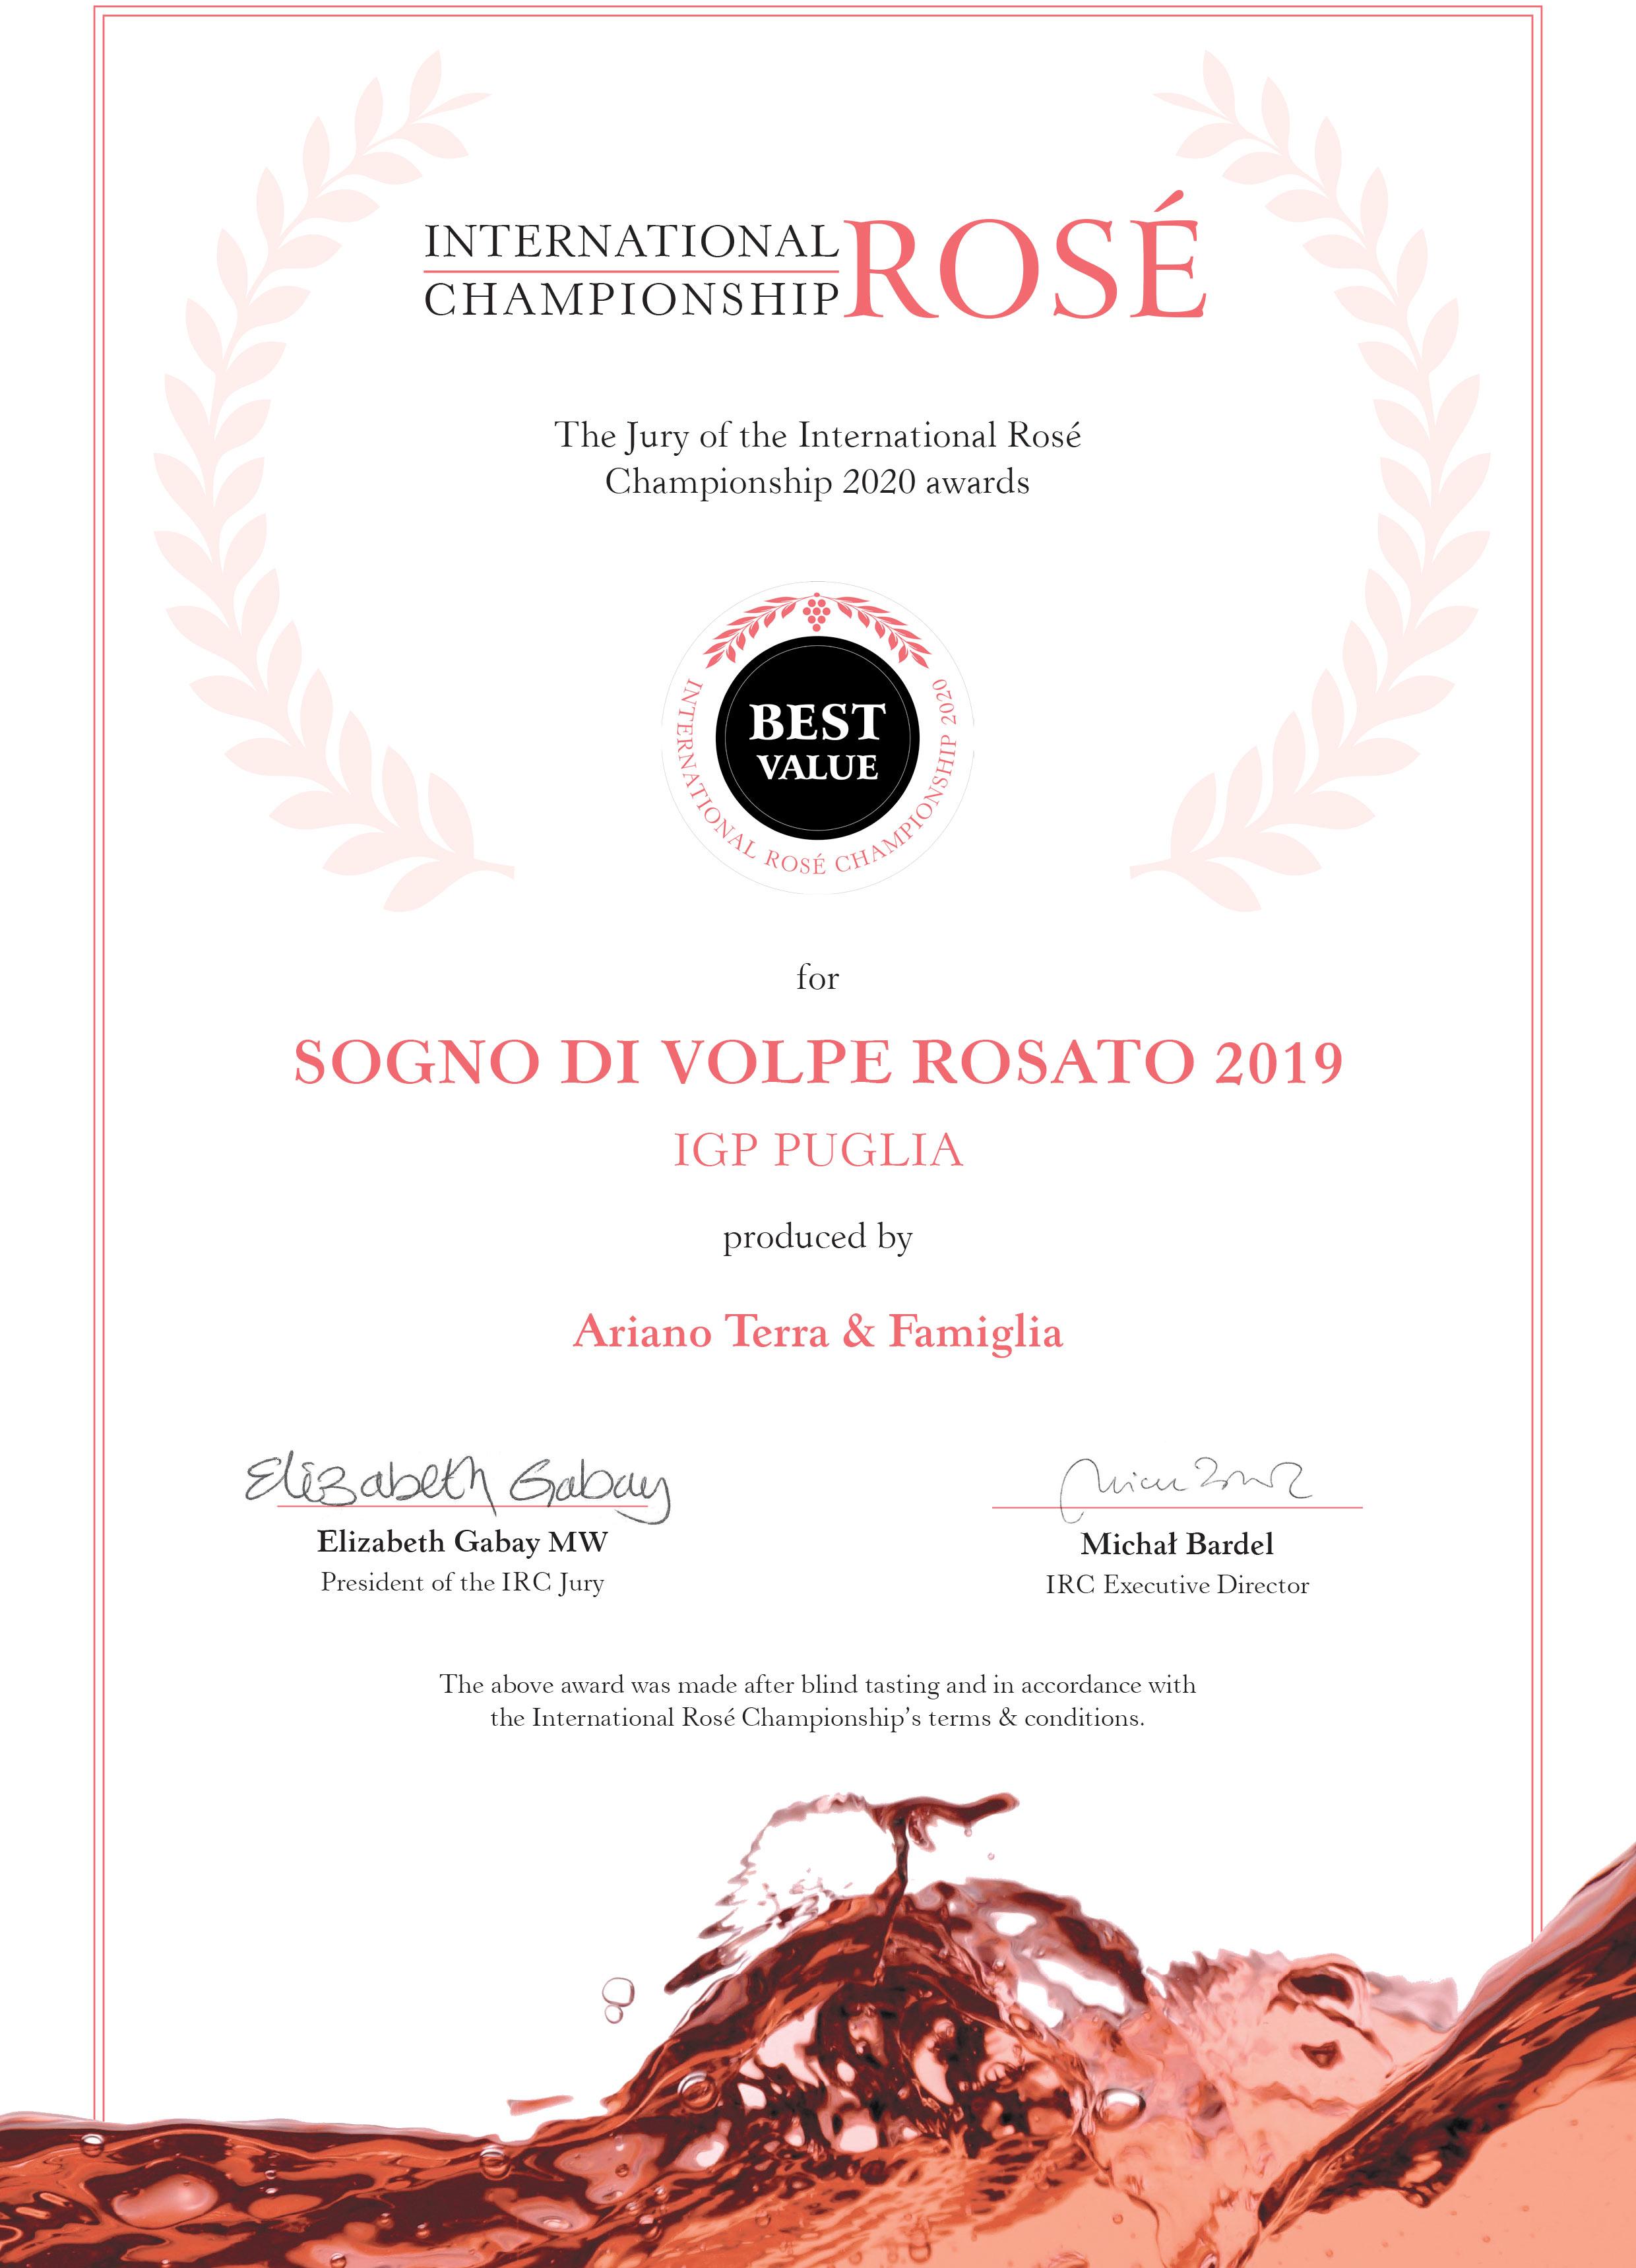 Best Value all'International Rosè Championship 2020